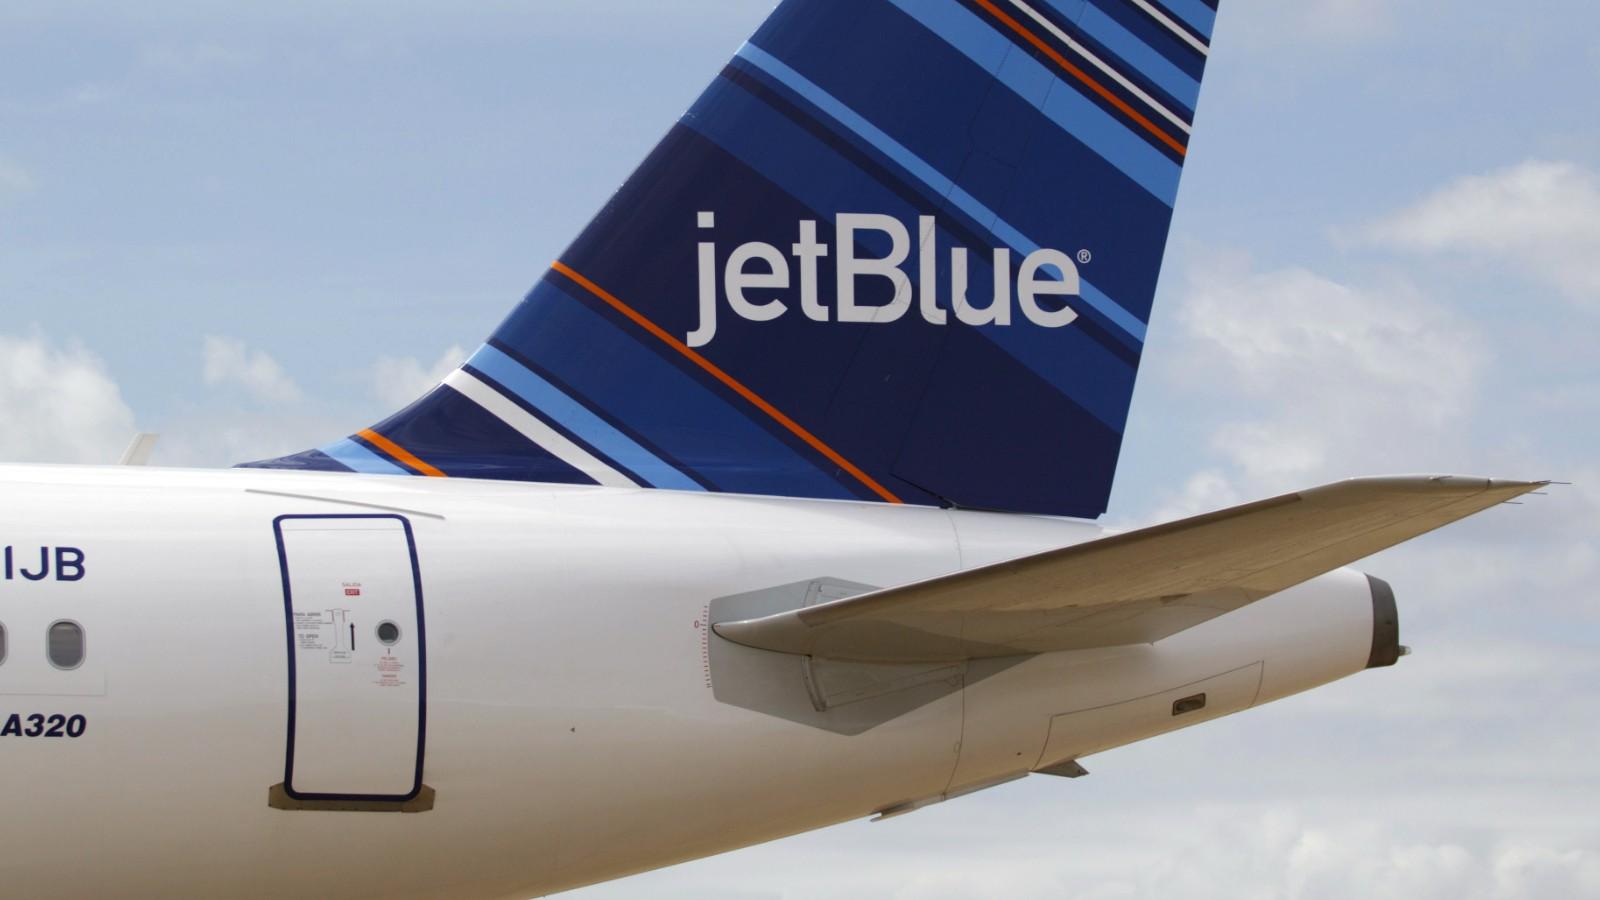 jet blue airlines mission statement